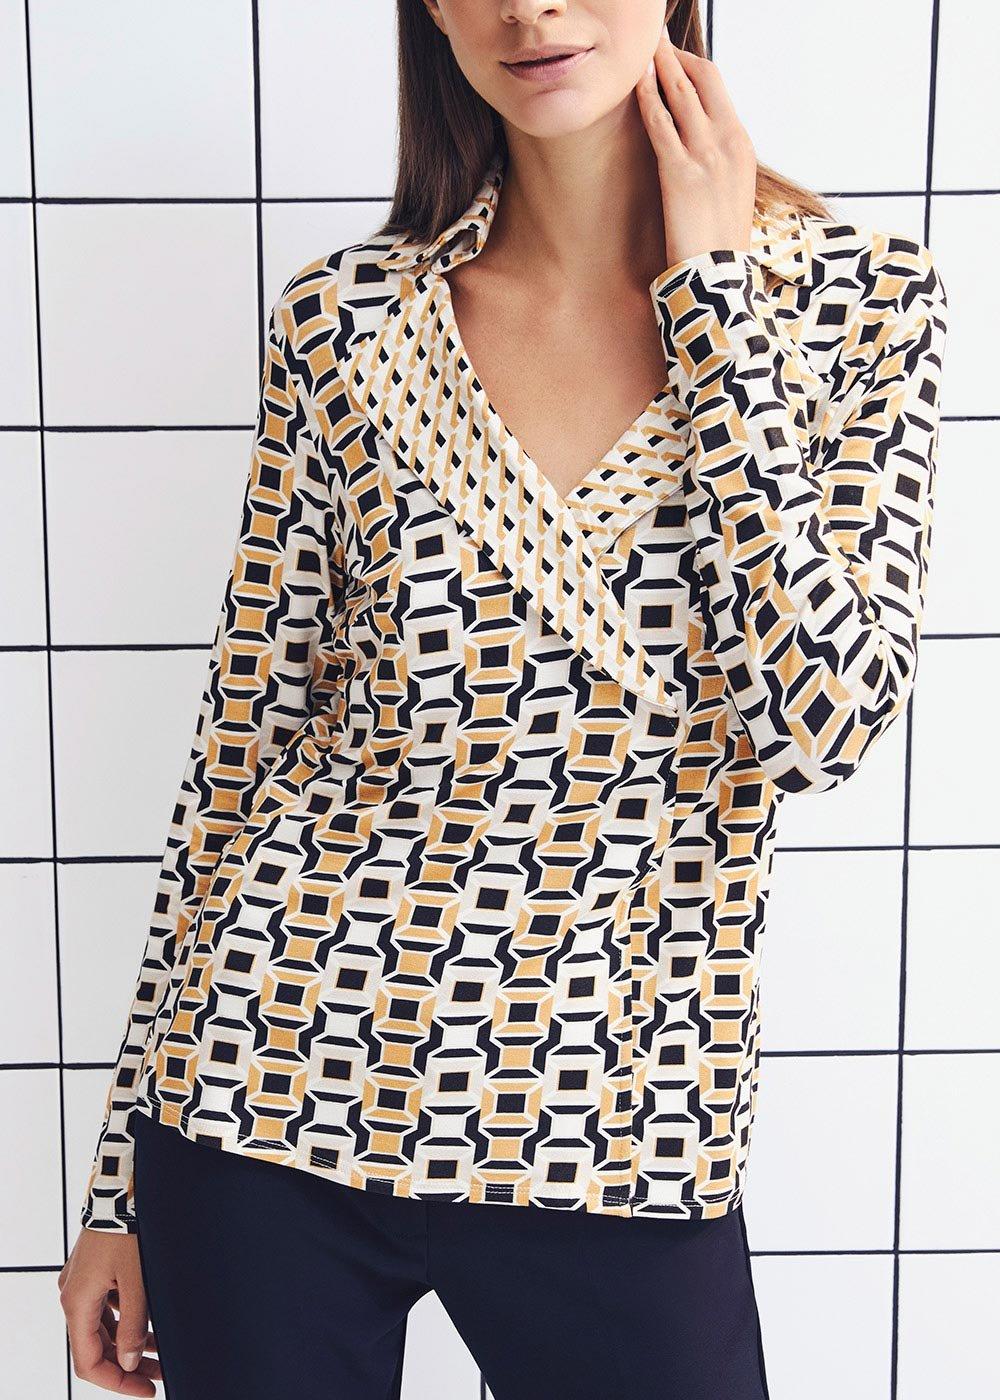 Silvye T-shirt with geometric pattern - Black /  Honey Multi - Woman